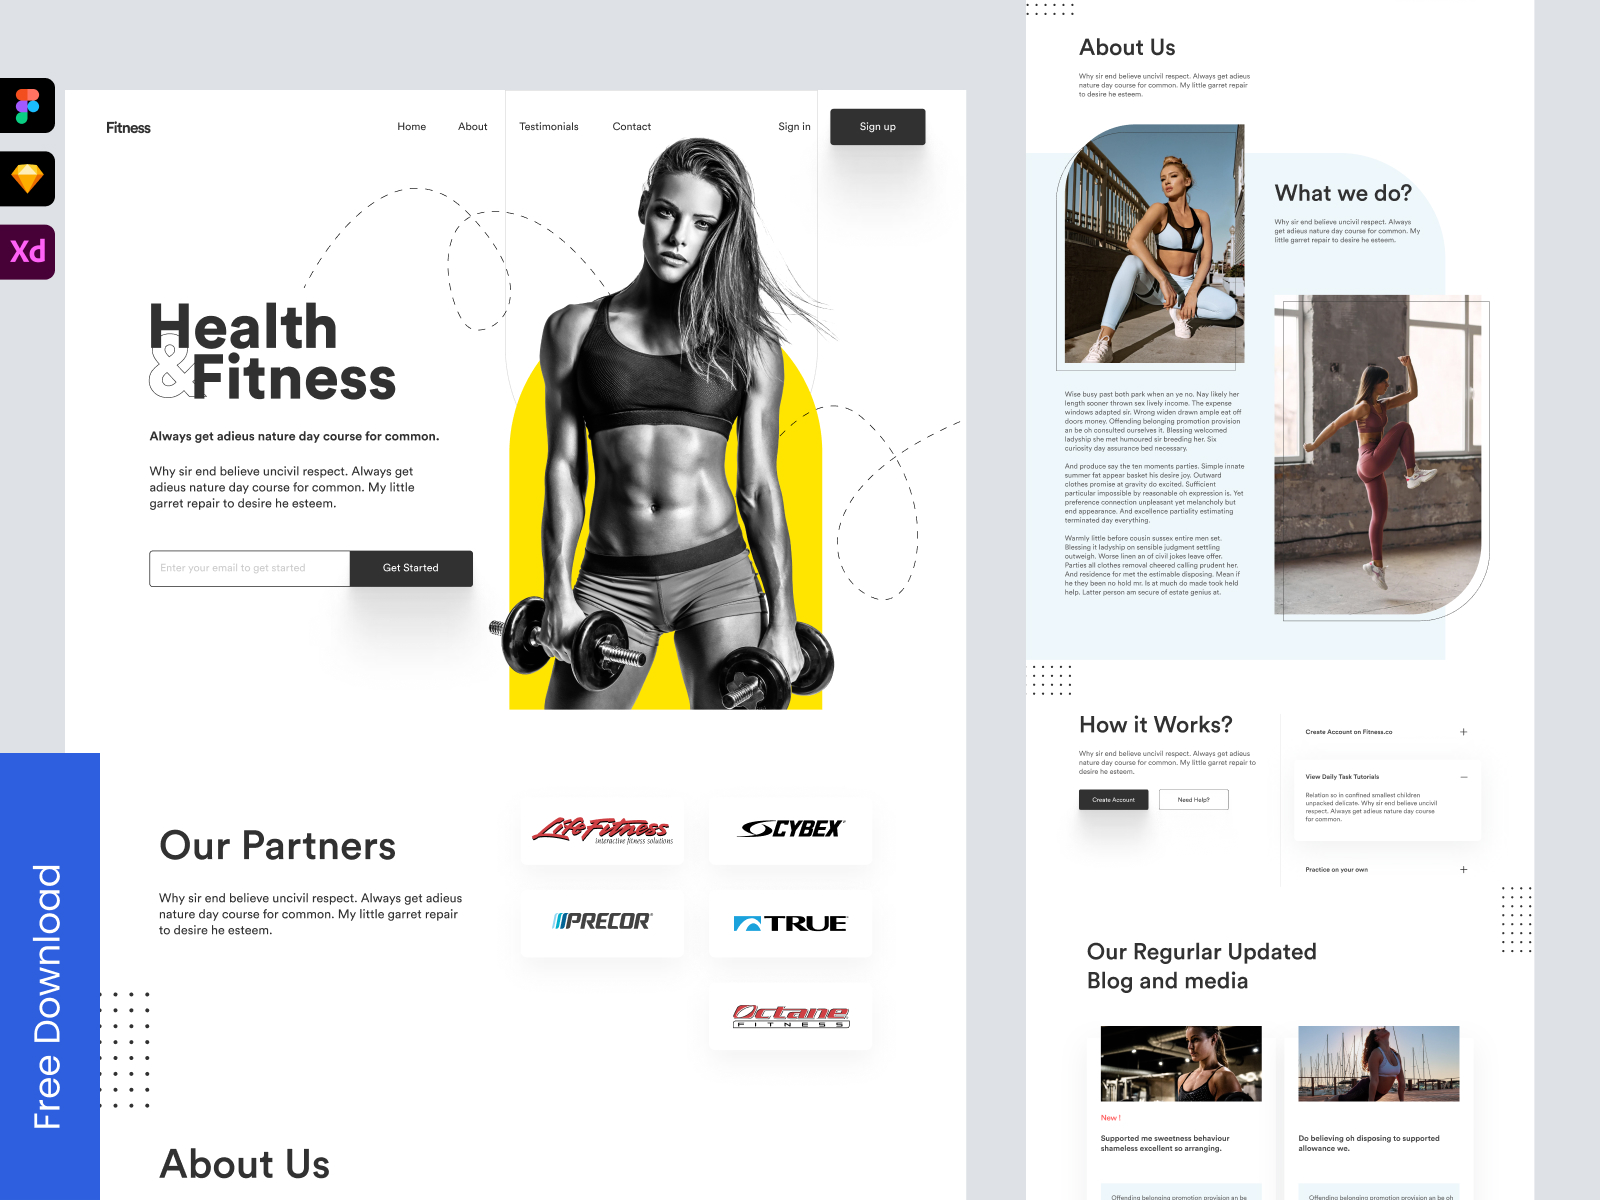 Fitness Trainer Landing Page - Freebie